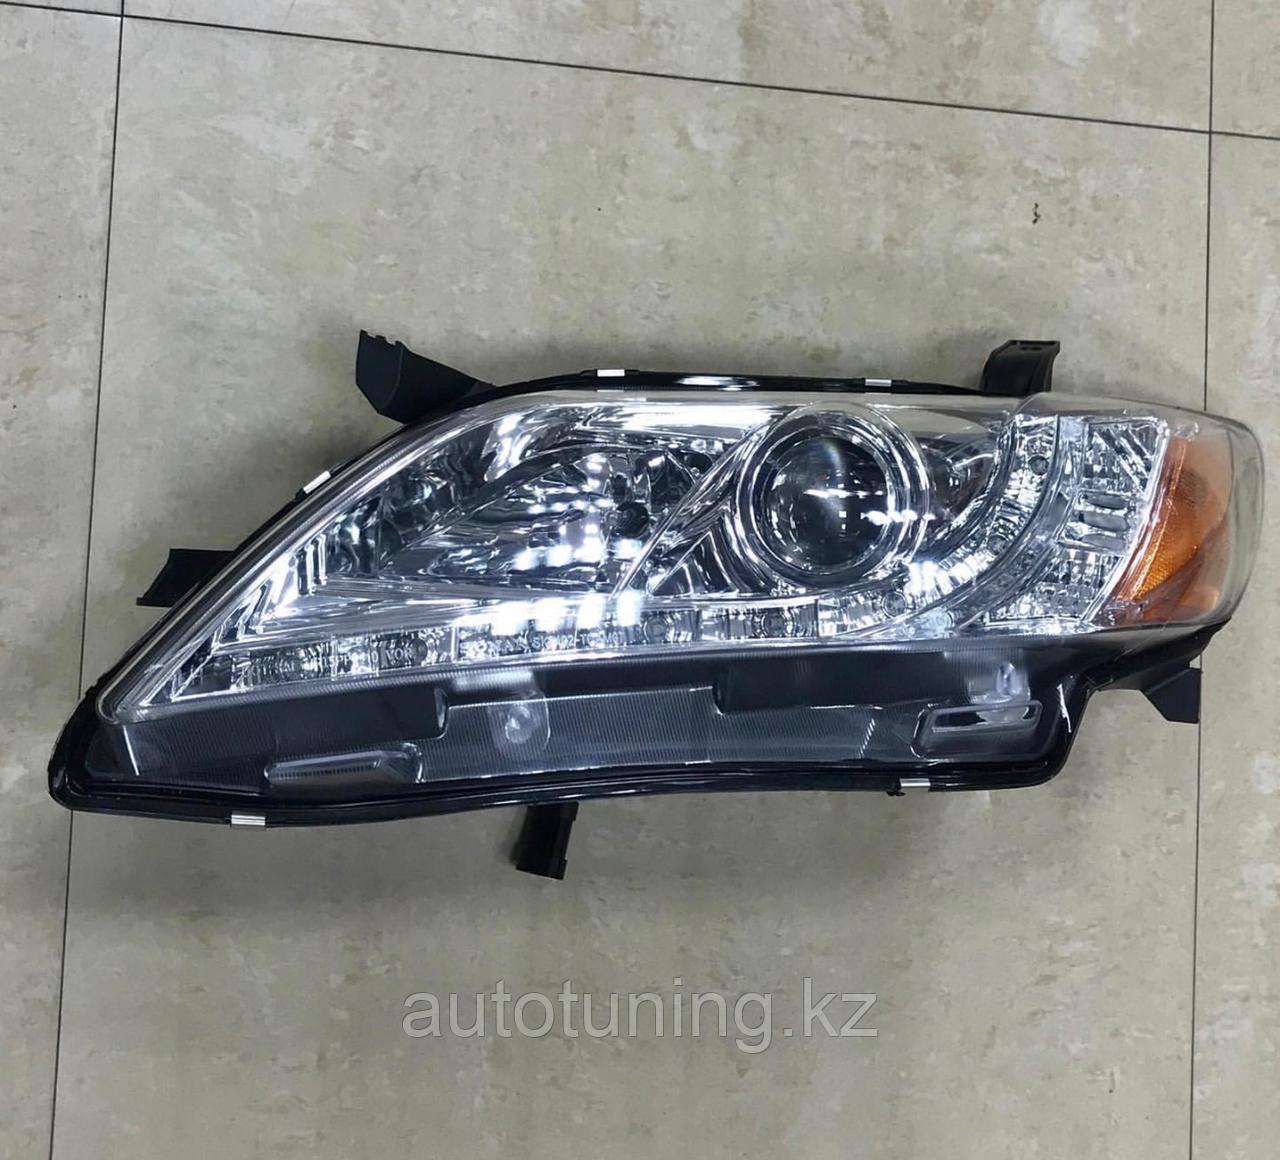 Альтернативная оптика на Toyota Camry 40 2006-2009 Chrome Design